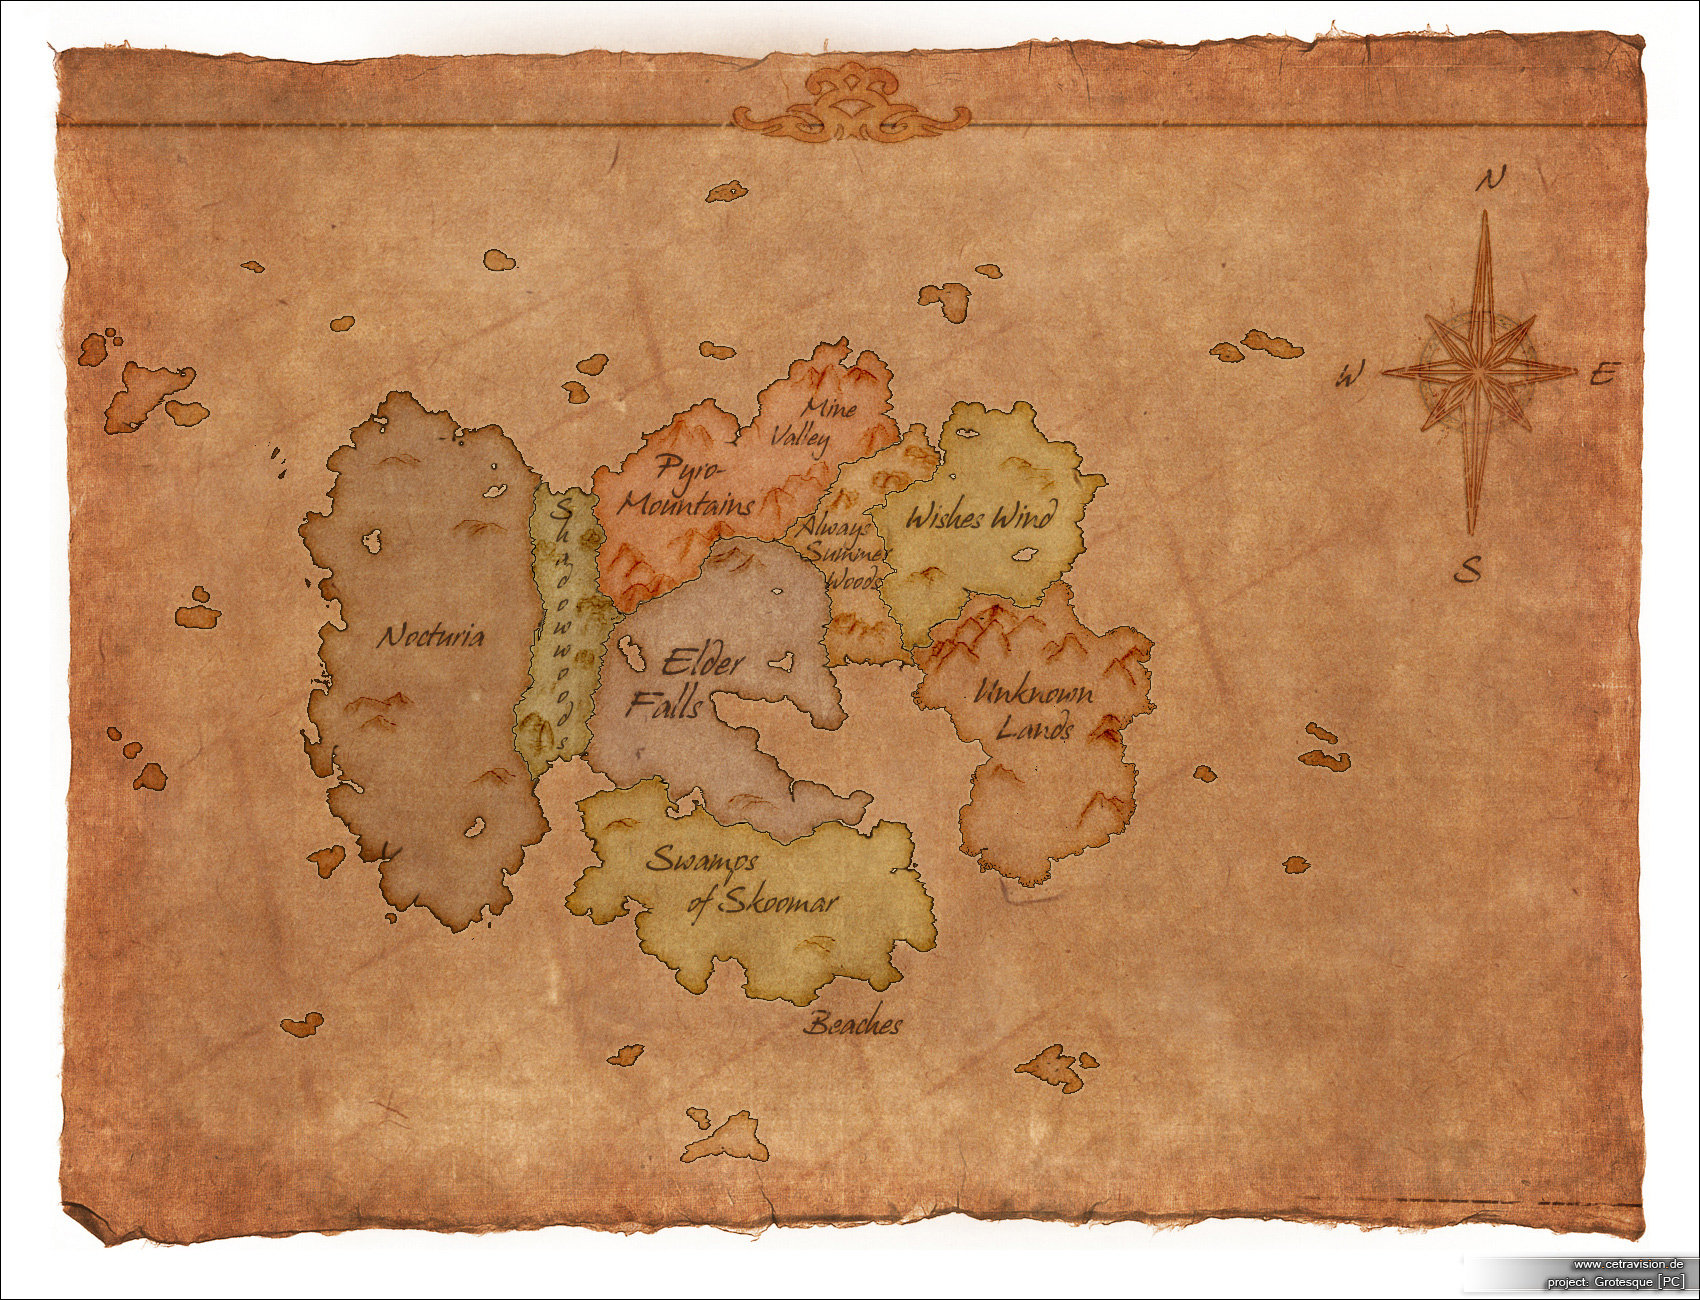 Carina schrom grotesque map